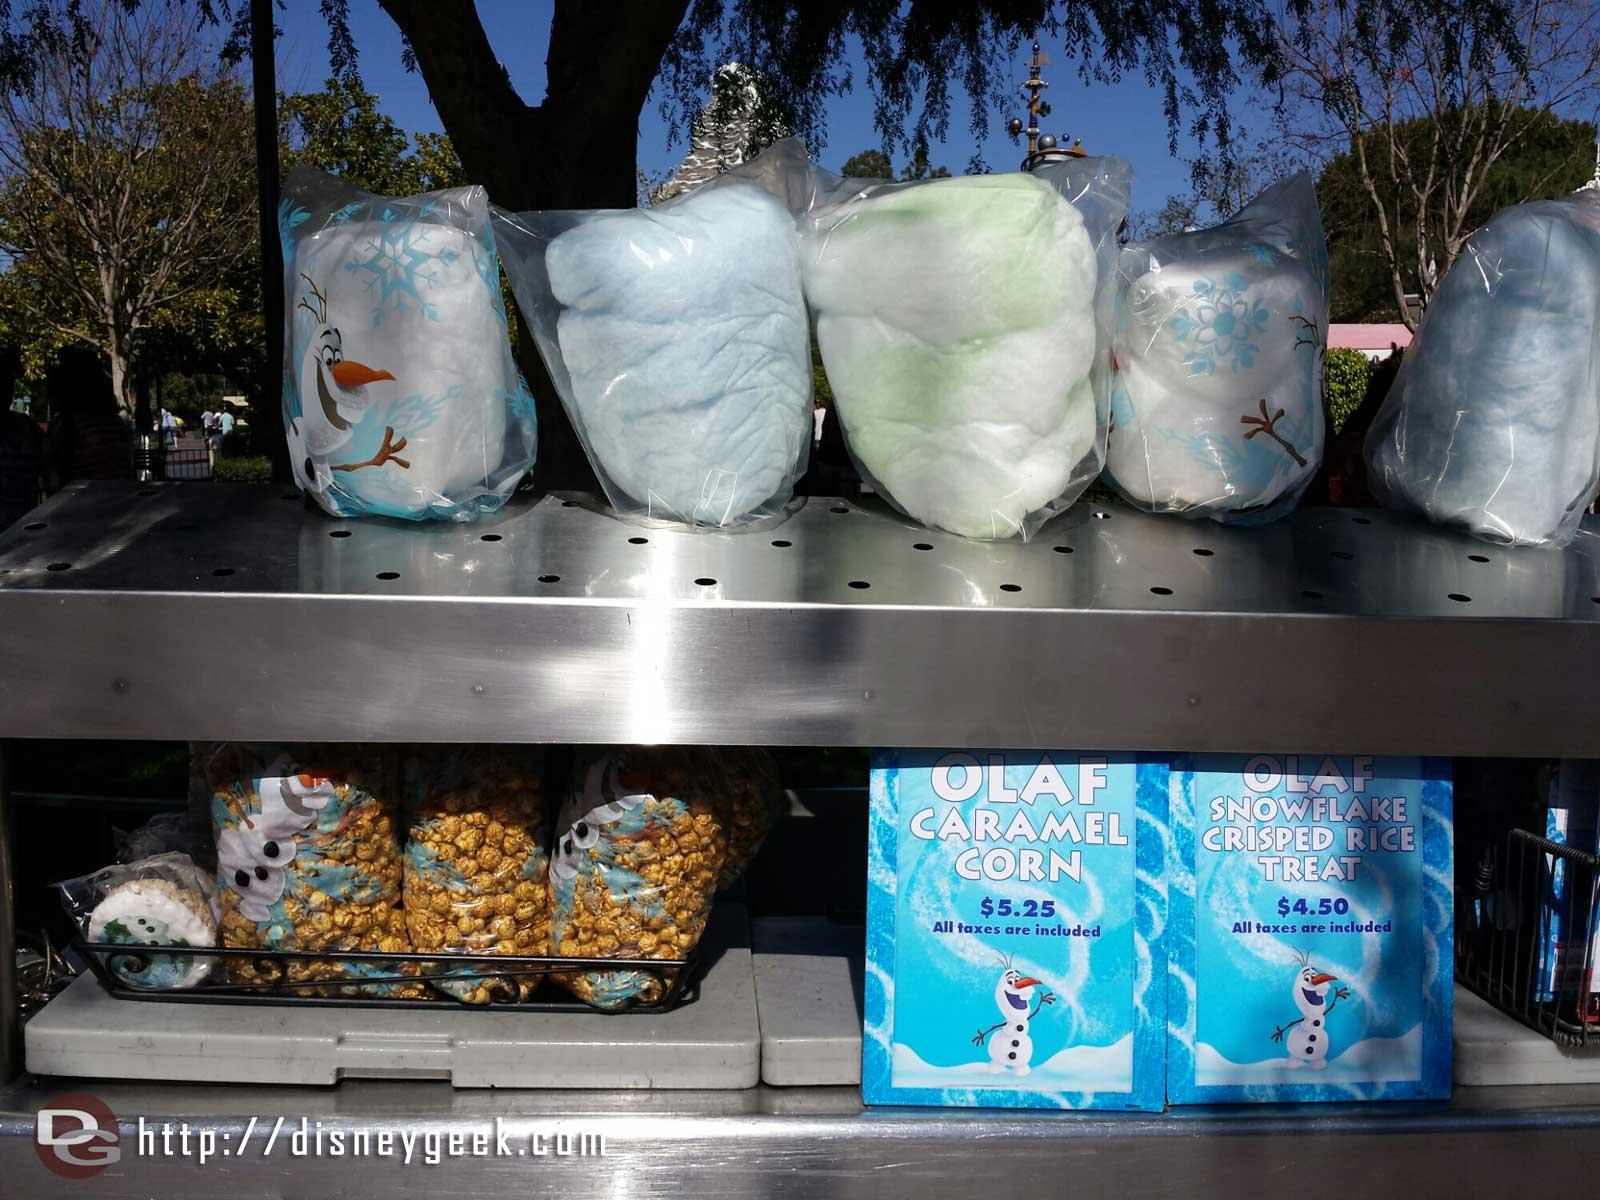 A cart selling an assortment of Olaf treats on Main Street USA #Disneyland #Frozen